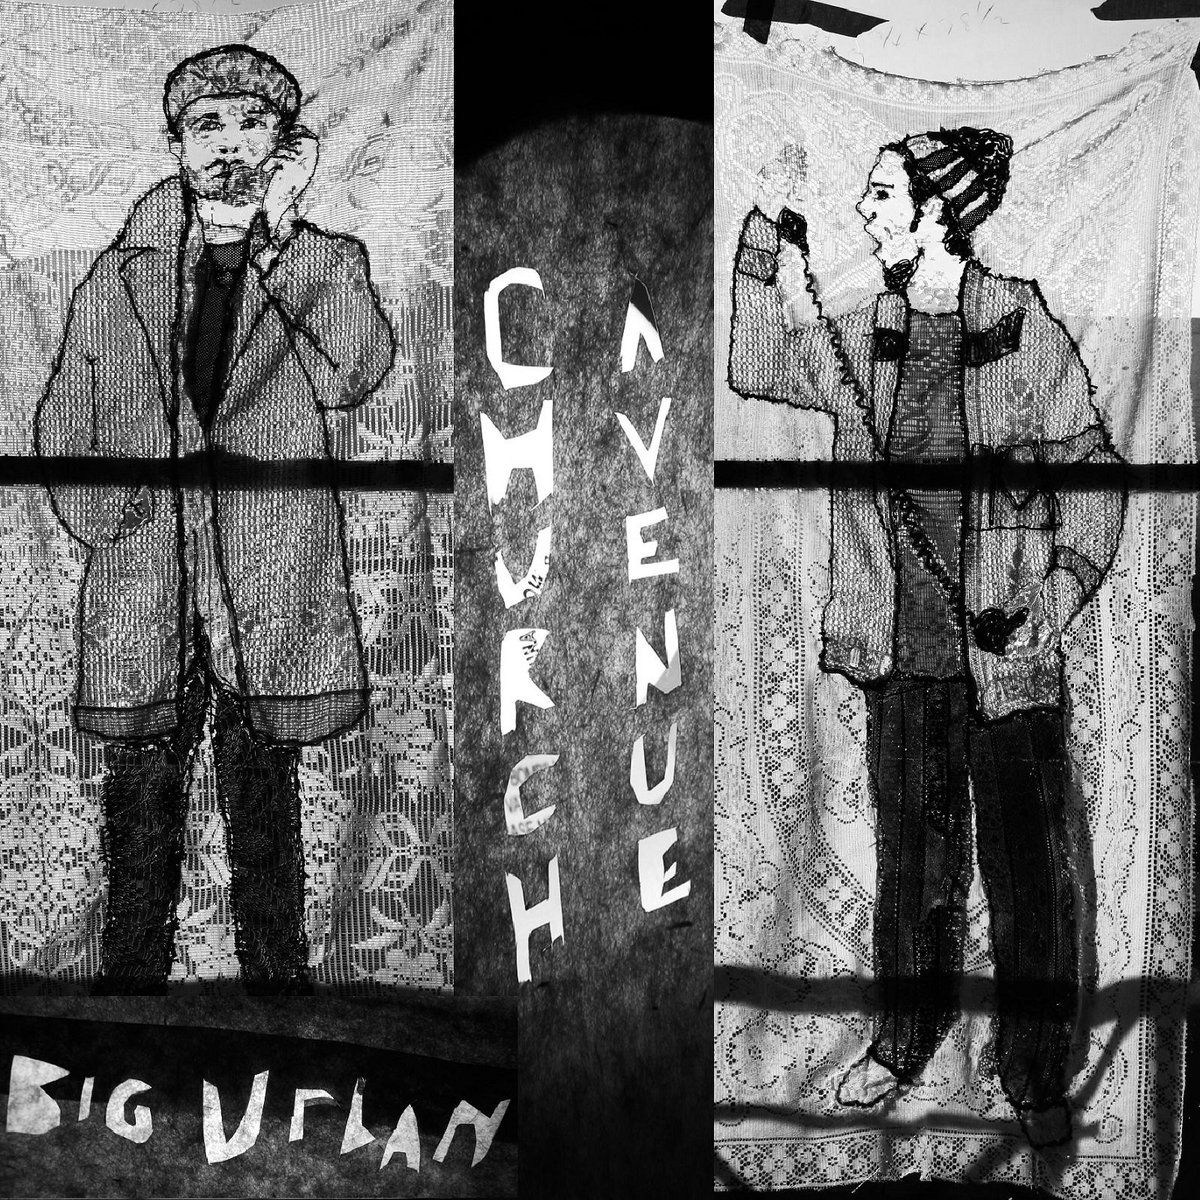 Big Urban's album cover for Church Avenue